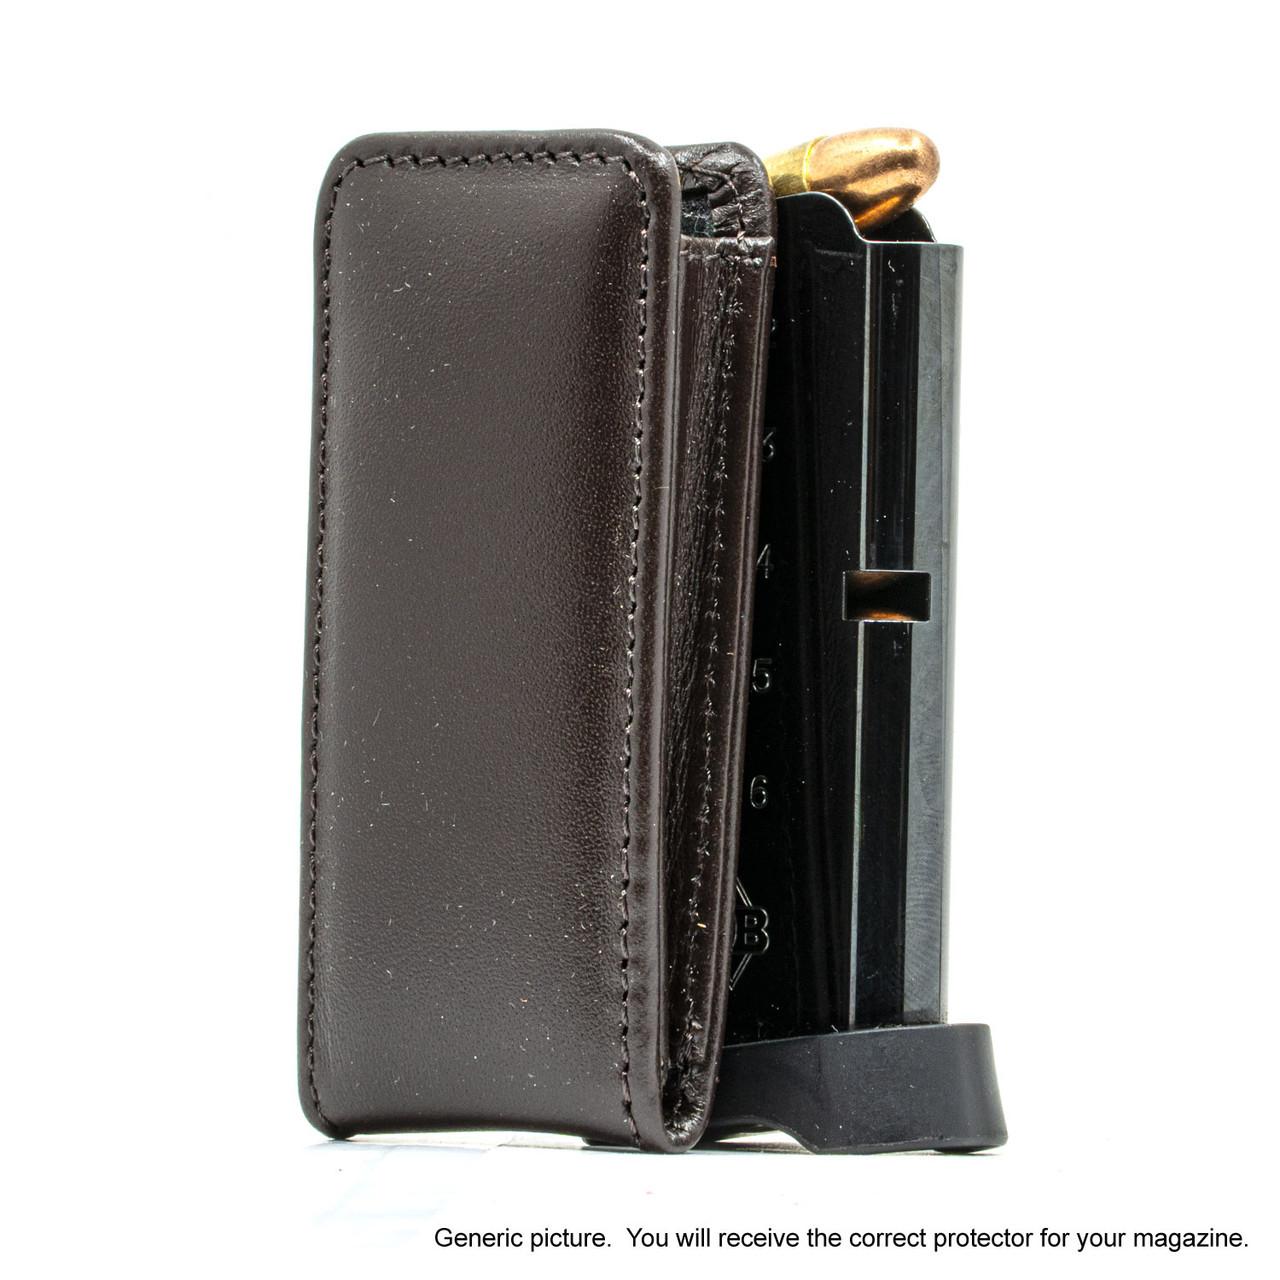 Remington RM380 Brown Leather Magazine Pocket Protector